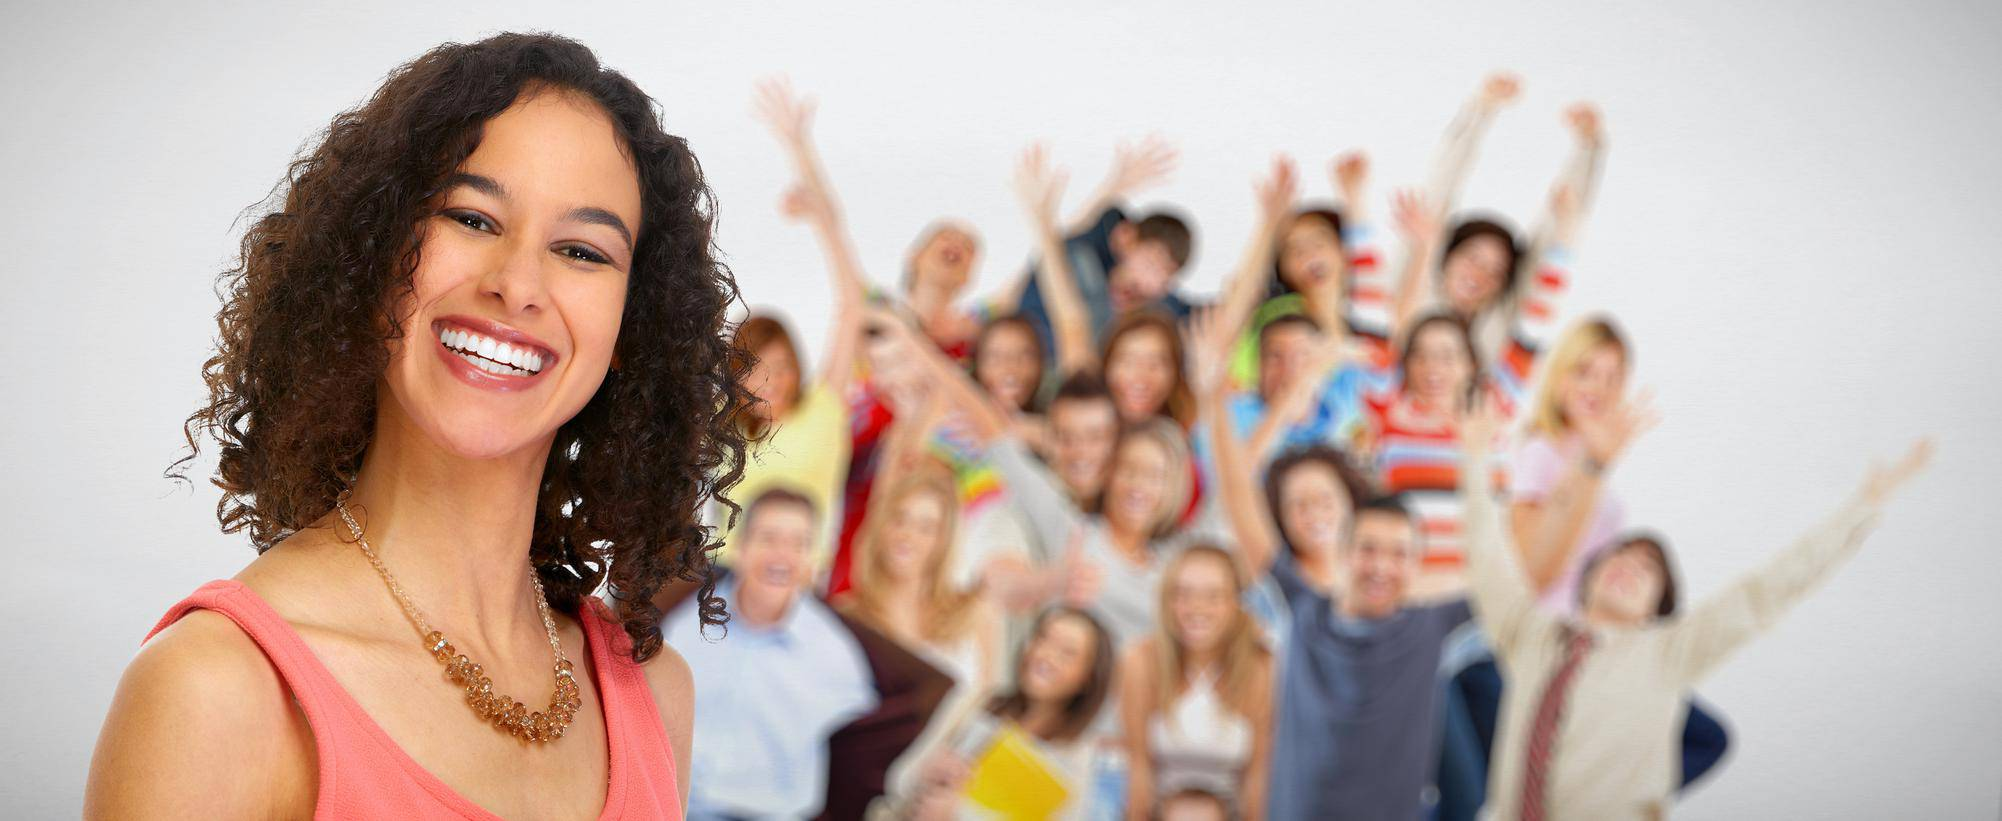 Sozialarbeiter / Sozialpädagoge (m/w/d)